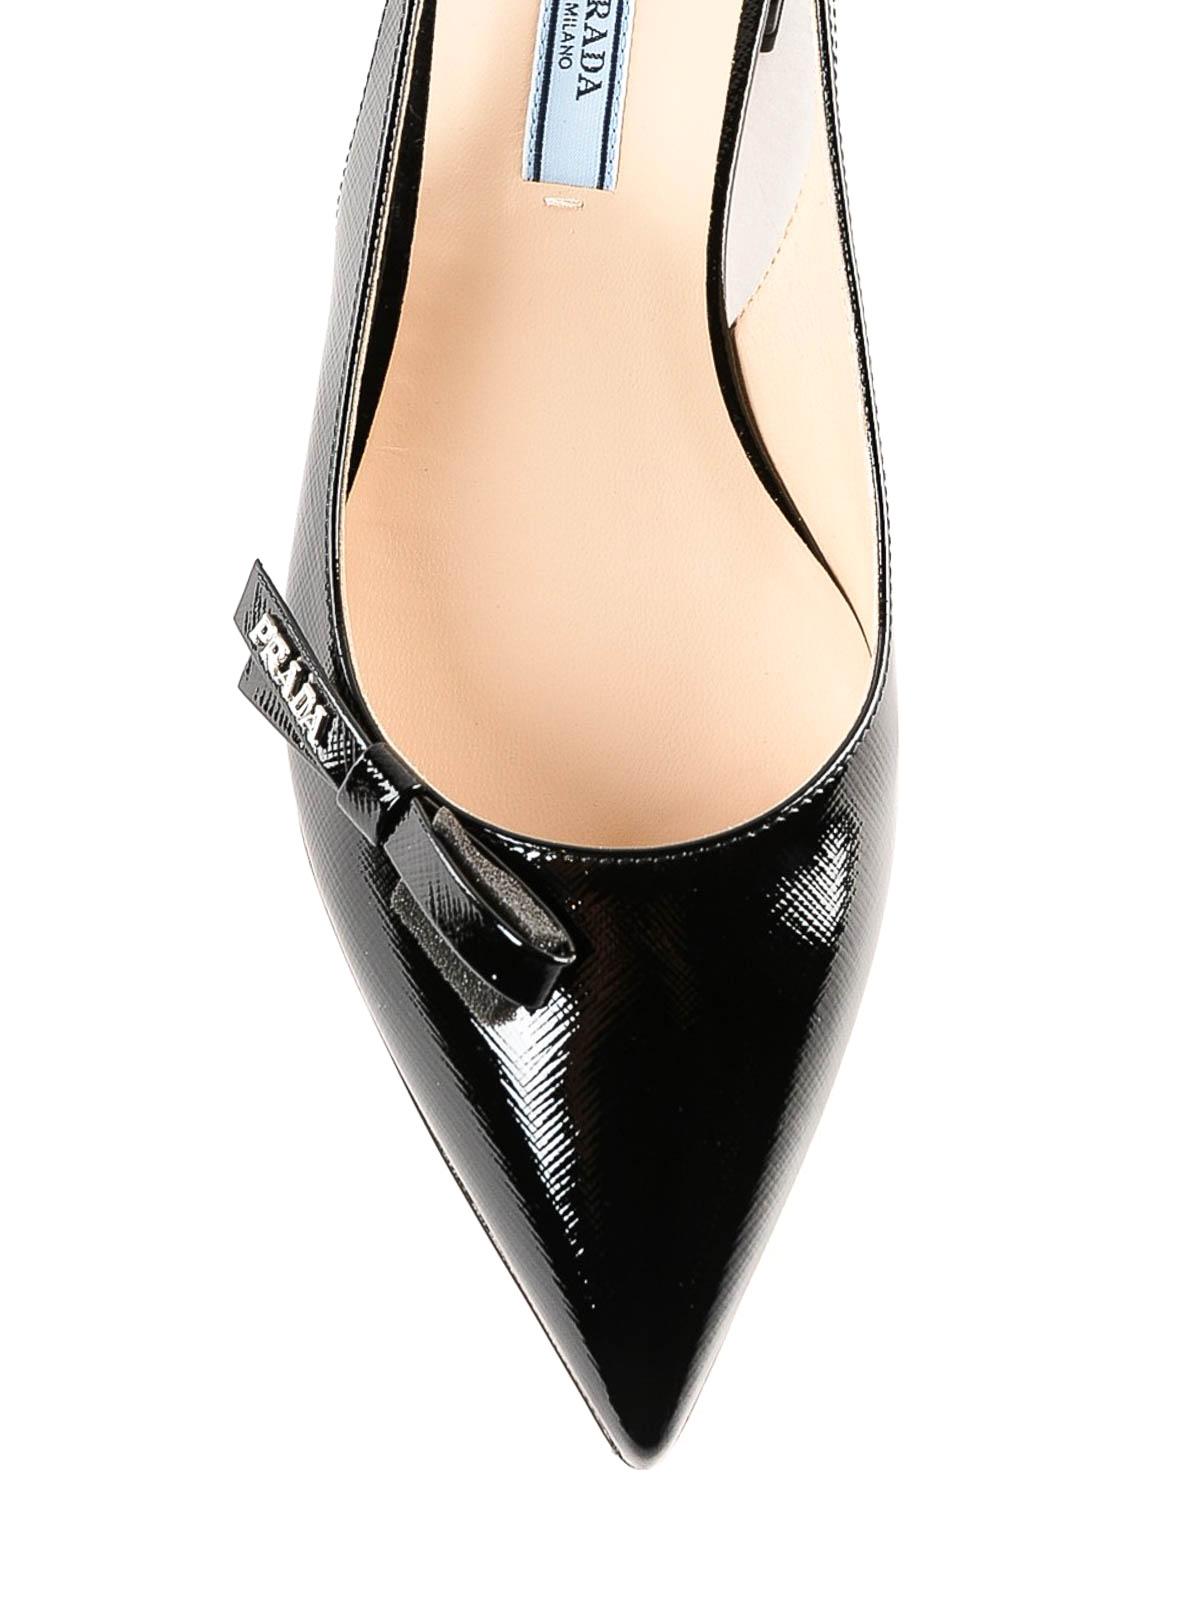 Black patent leather slingback flat